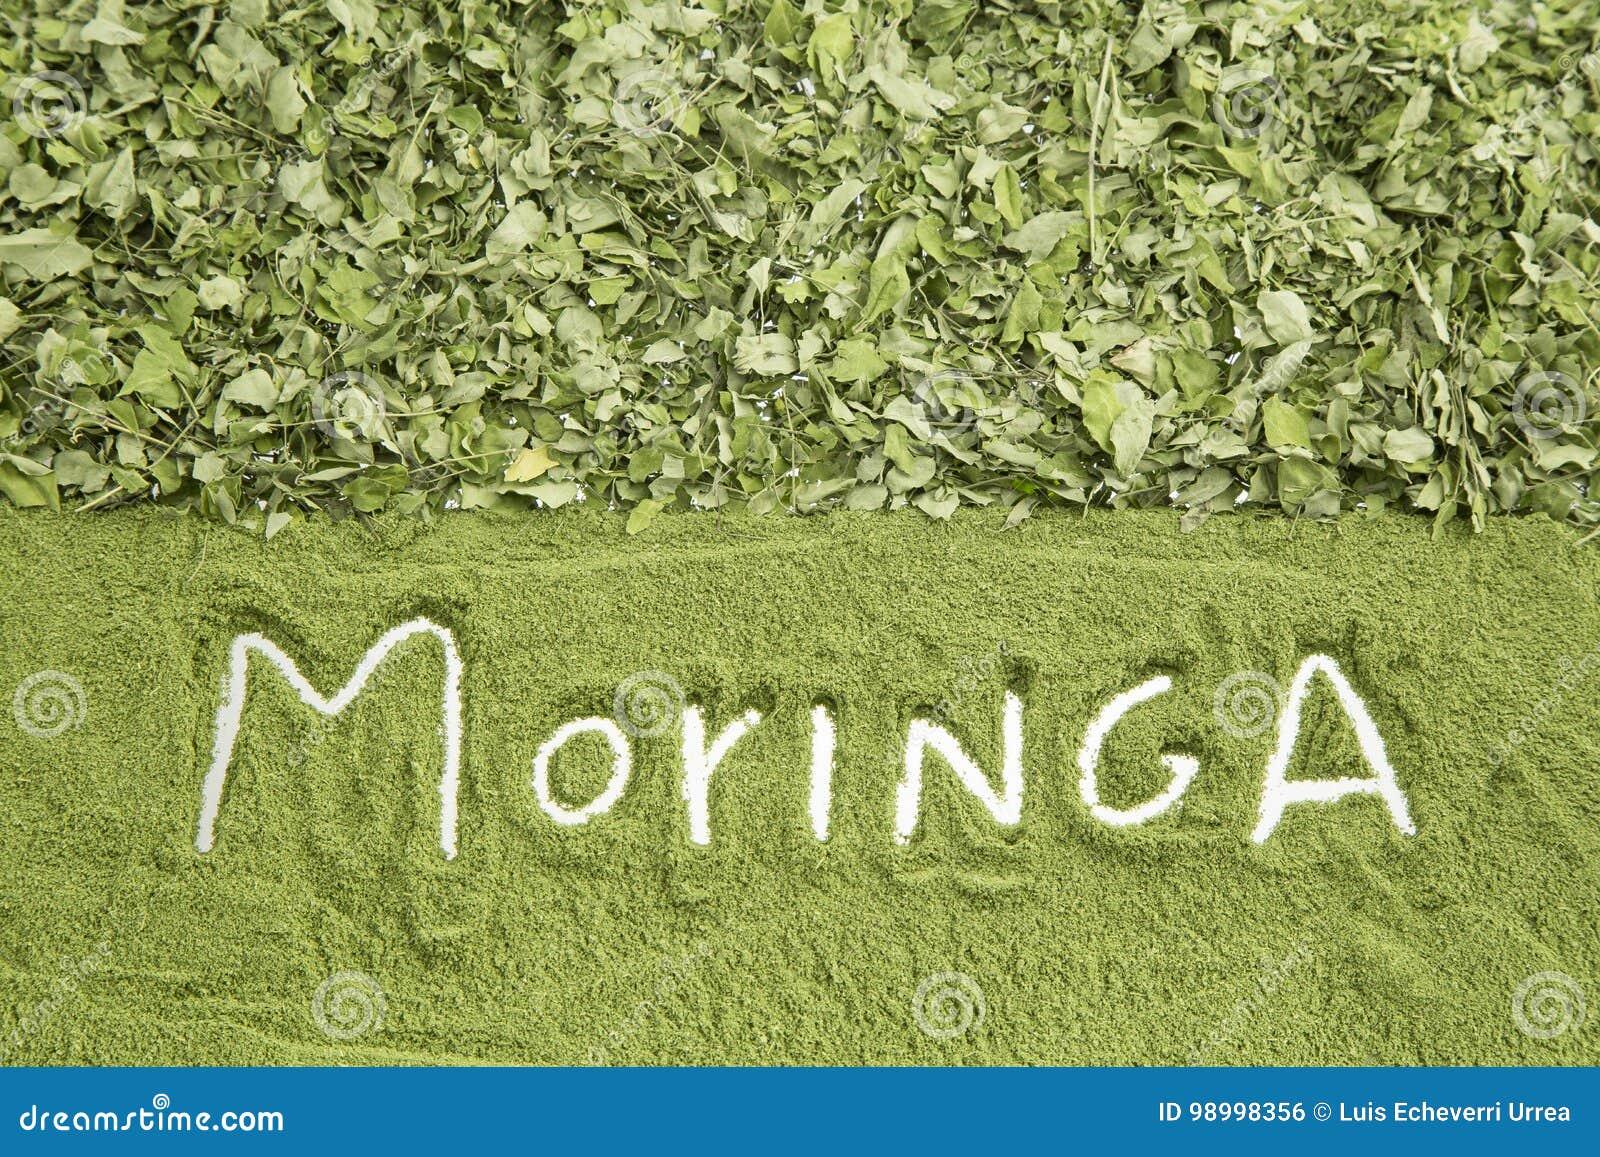 Moringa Blatter Und Staub Moringa Oleifera Stockfoto Bild Von